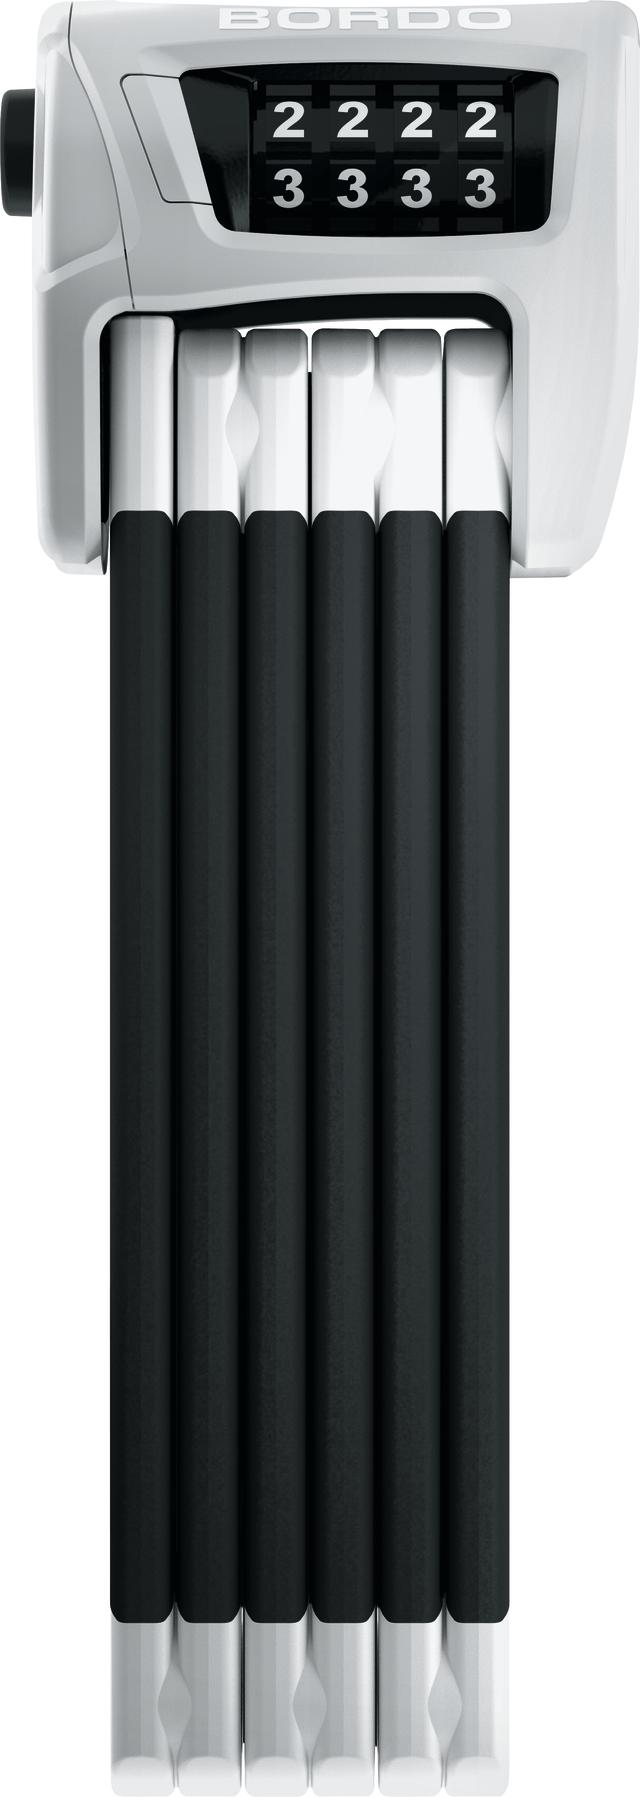 Folding Lock 6100/90 white SH